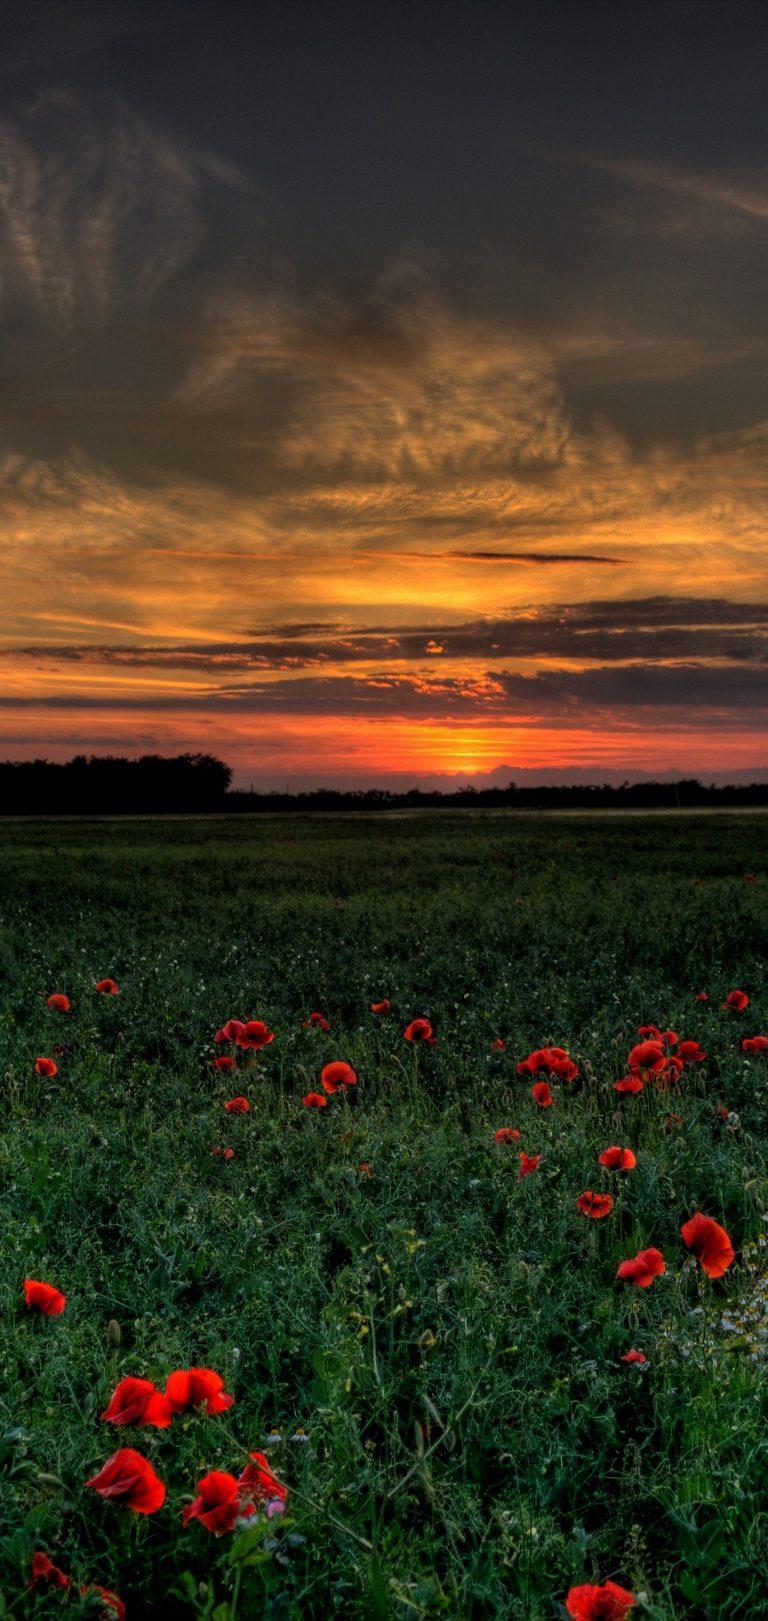 Sunset Field Poppies Landscape Wallpaper 1440x3040 768x1621